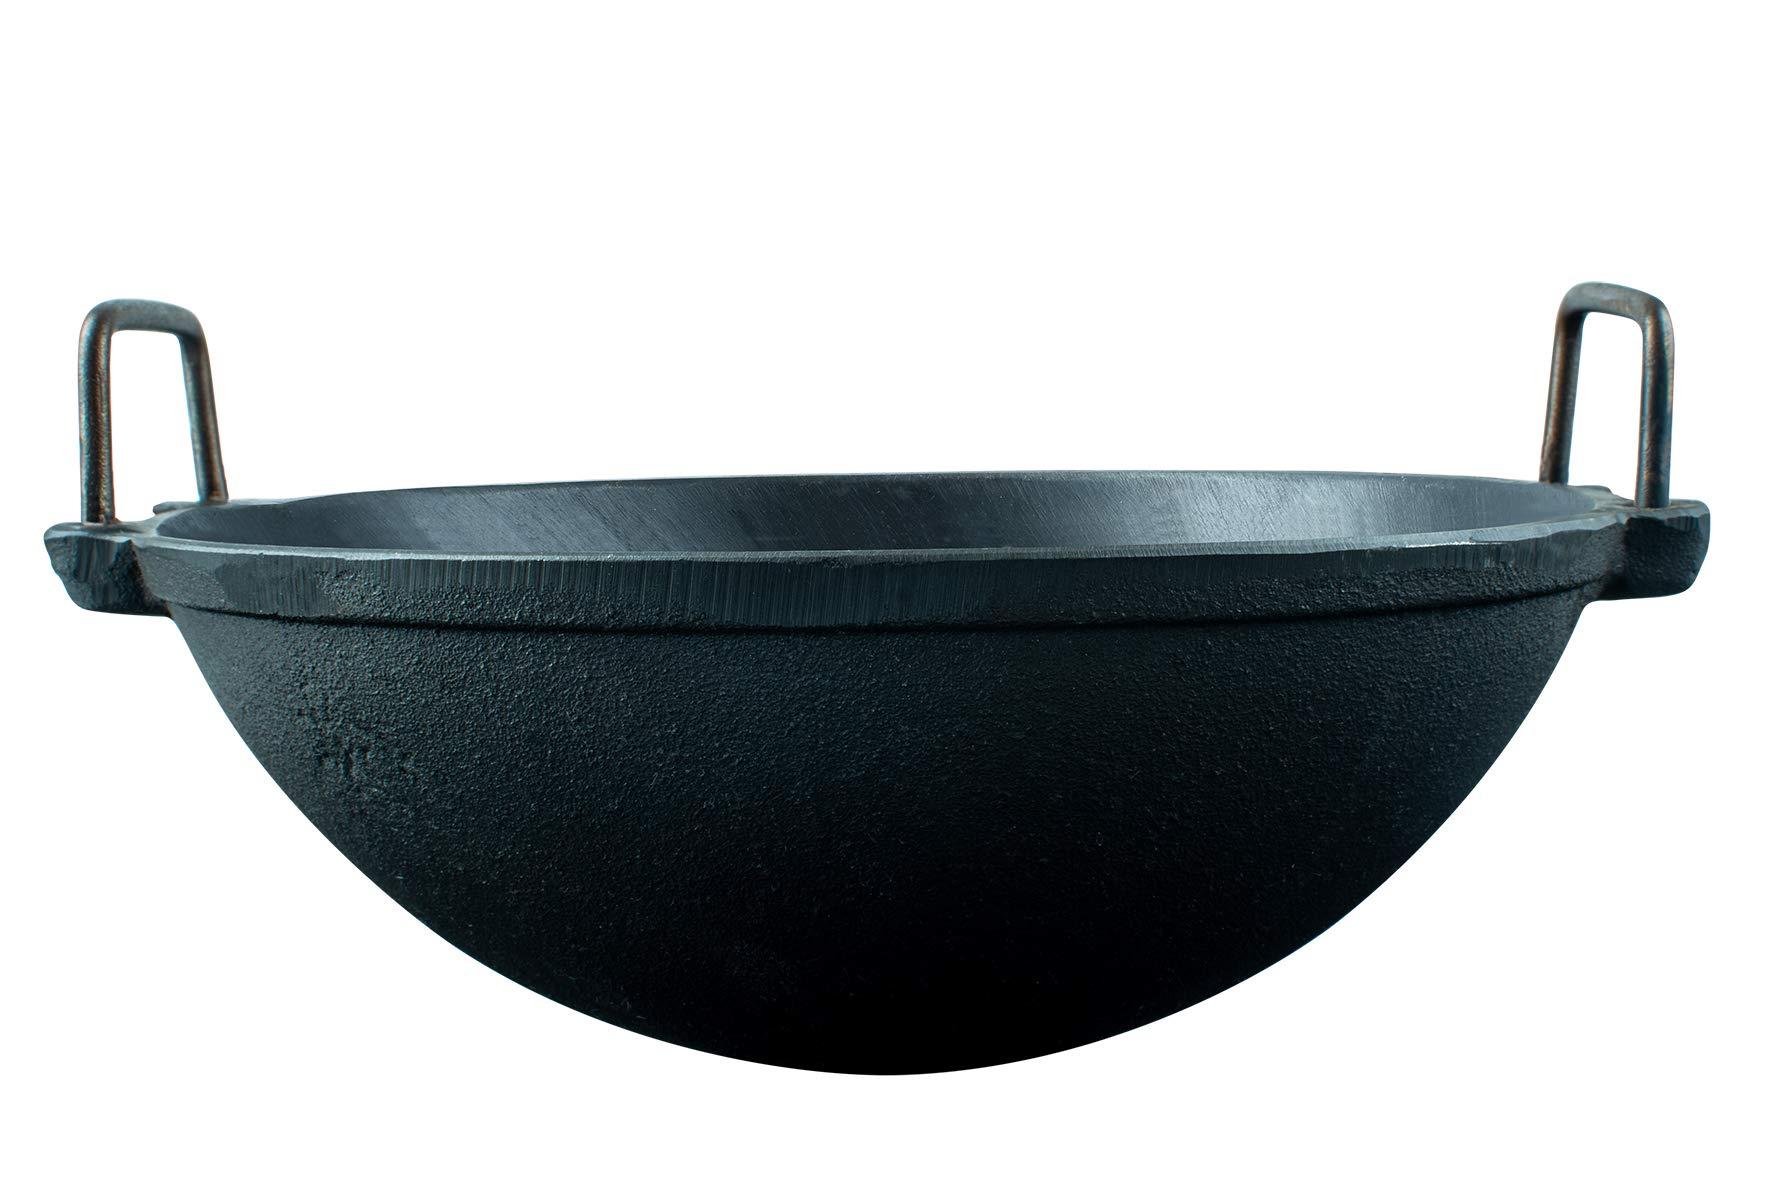 Mr. Butler Cast Iron Cookware – Kadai/Wok, Pre- Seasoned 11 Inch, Black